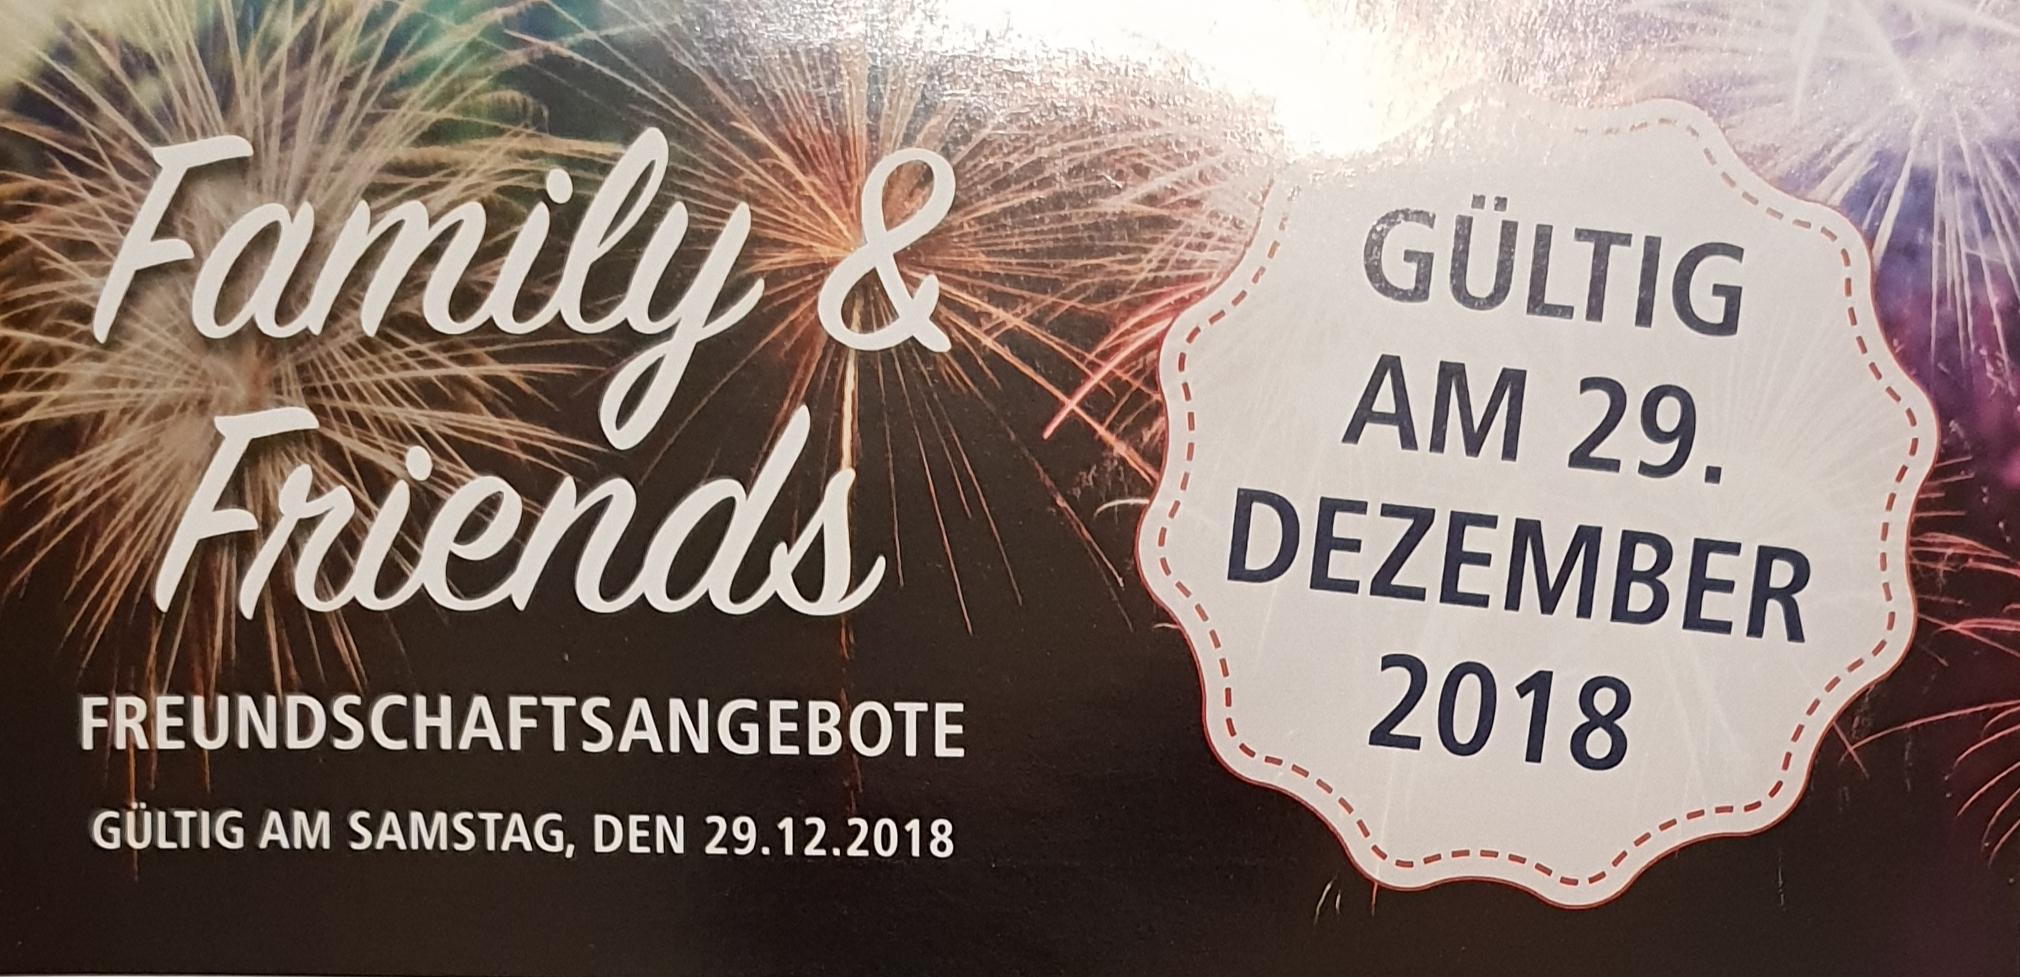 [REAL] Letzter Family & Friends Rabatt-Aktionstag des Jahres am 29. Dezember 2018 (bundesweit in allen Real Märkten)